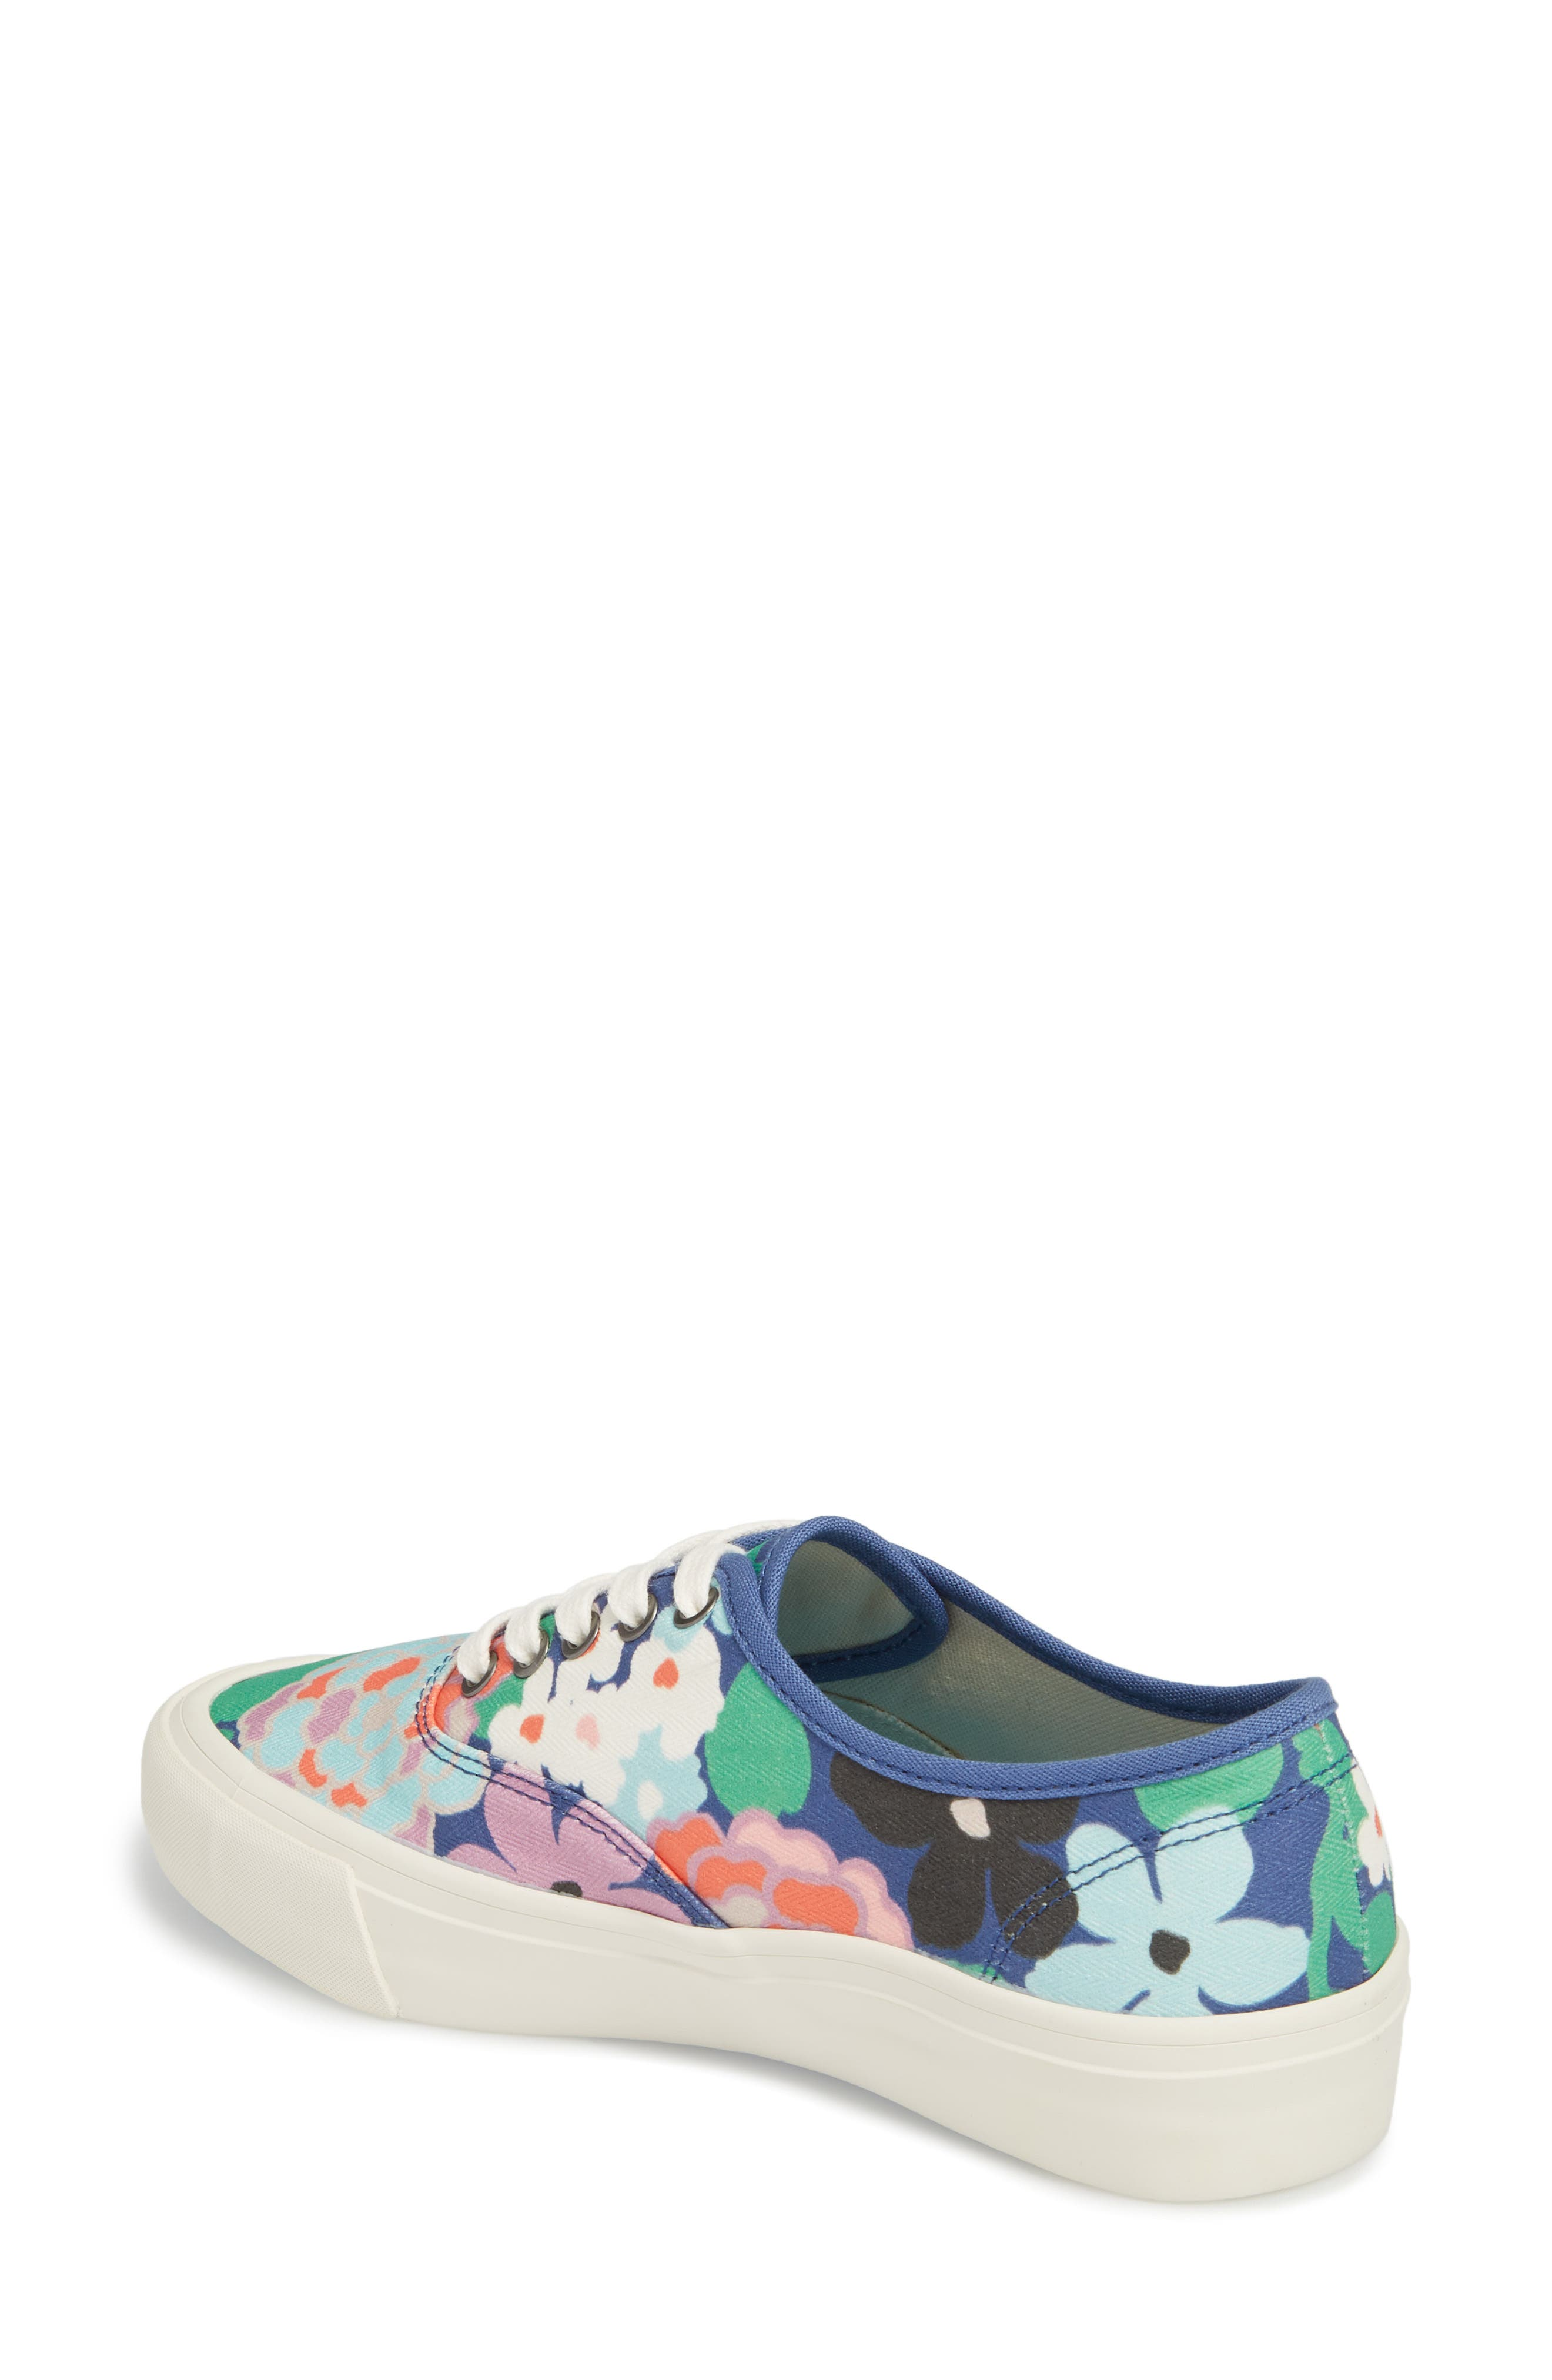 x Trina Turk Legend Sneaker,                             Alternate thumbnail 2, color,                             Greenhouse Floral